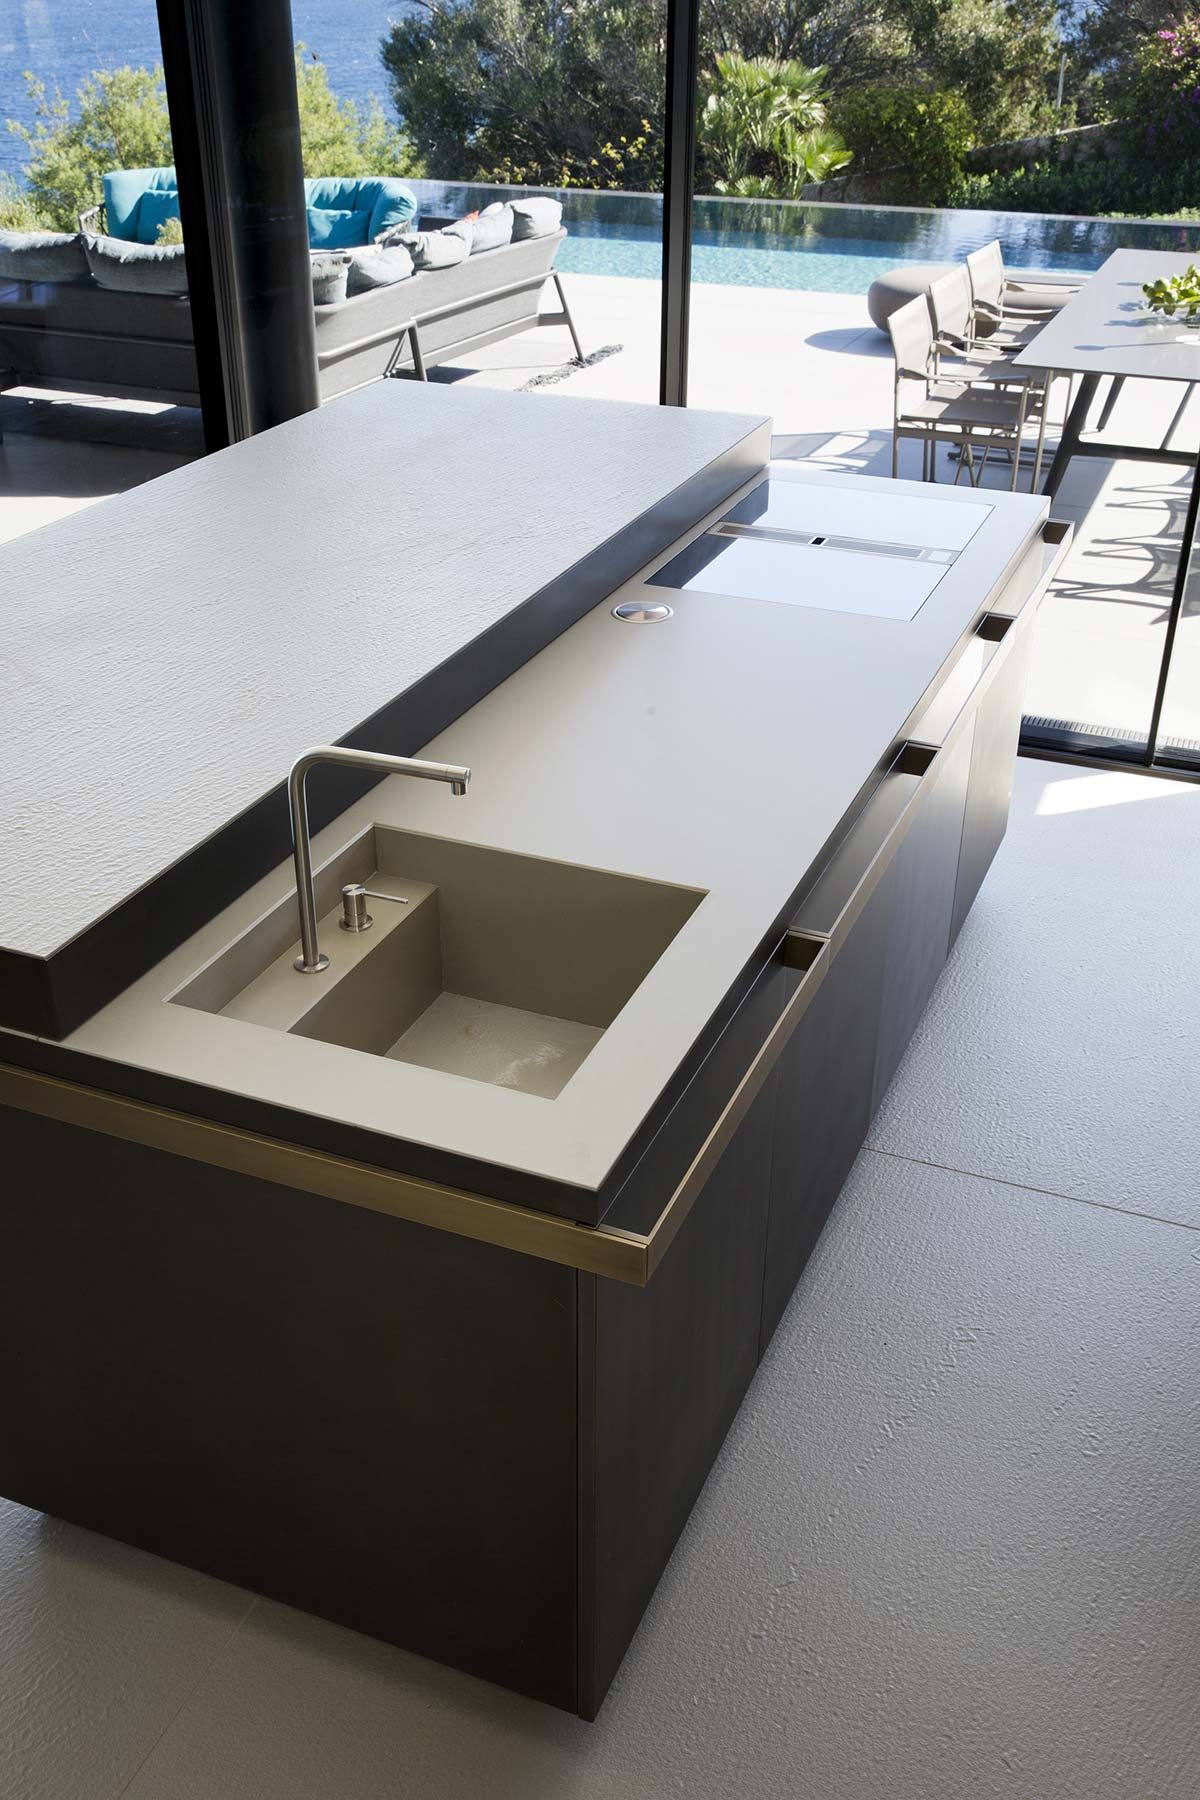 Kitchen top by Lapitec - Villa Emma